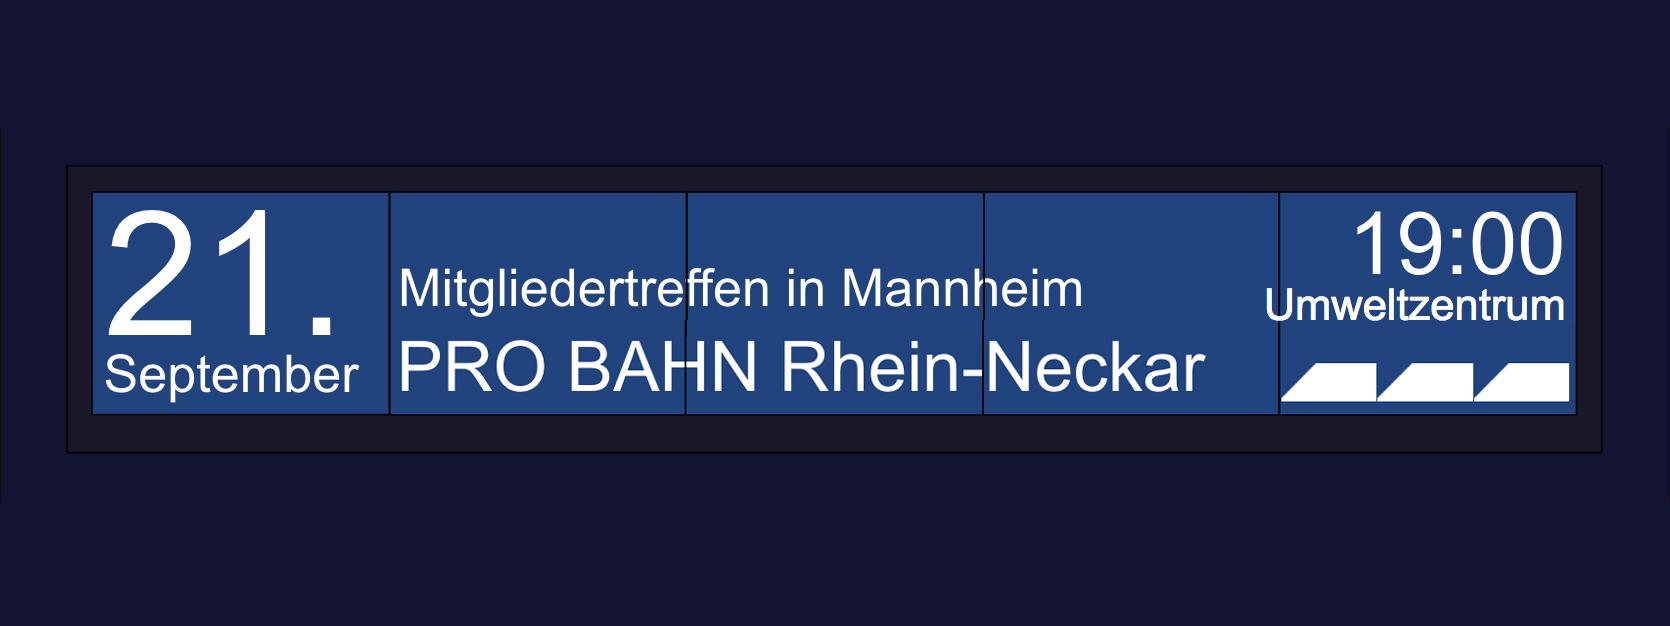 PROBAHN Rhein-Neckar